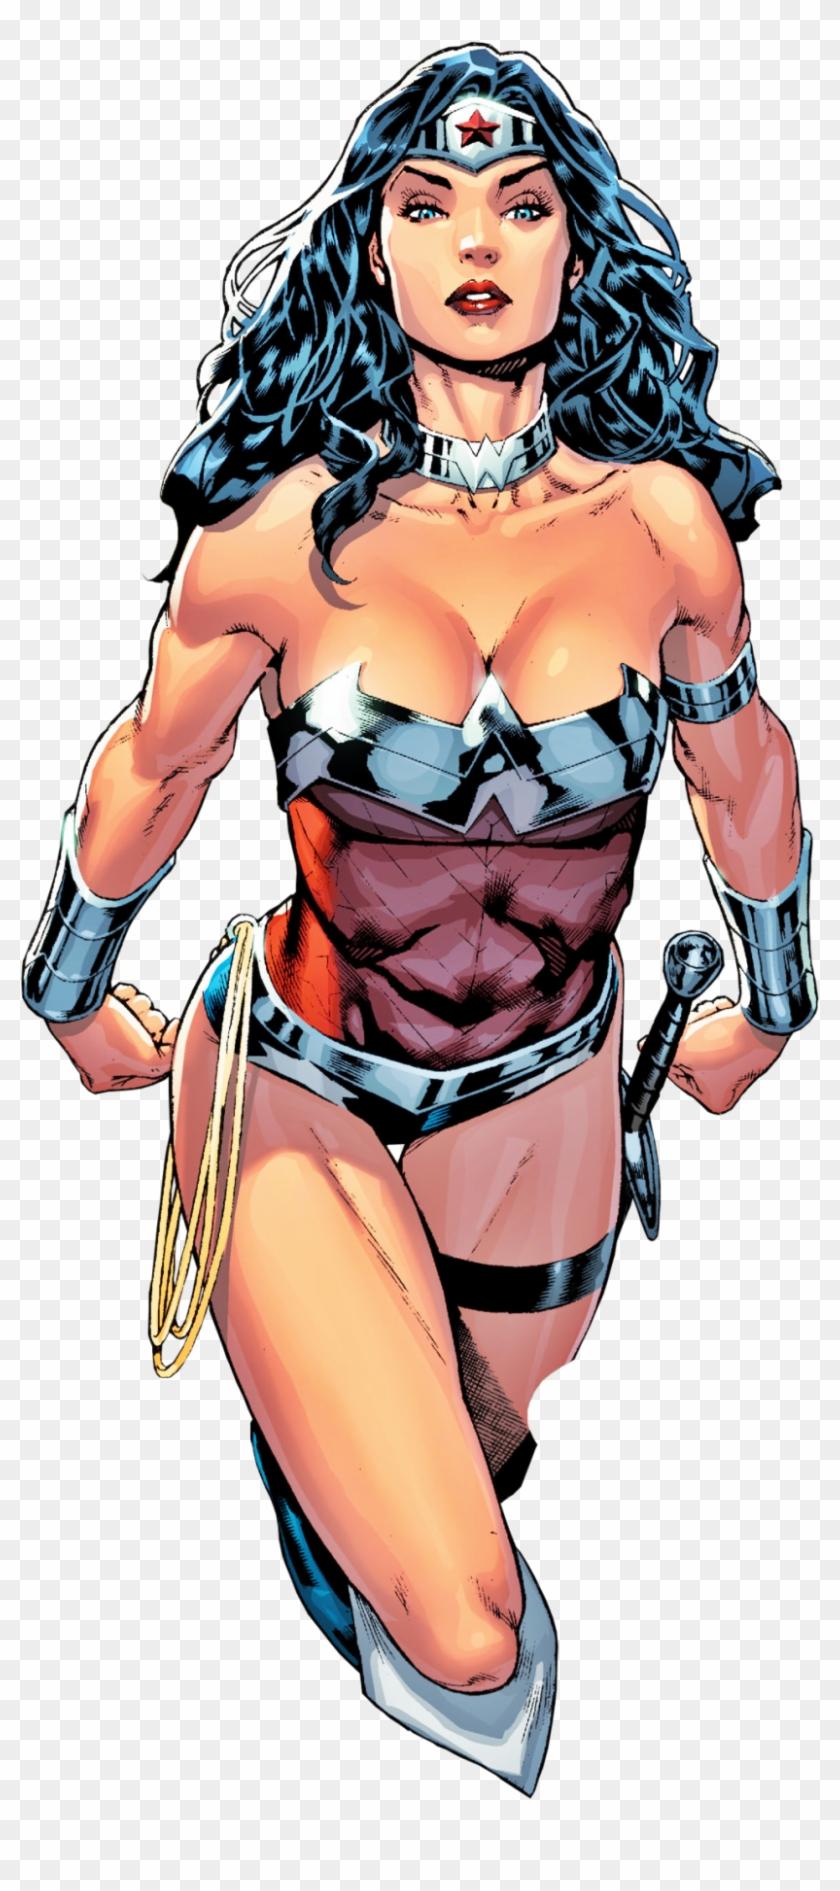 Wonder Woman - Comic Wonder Woman Cartoon Full Body #1033166